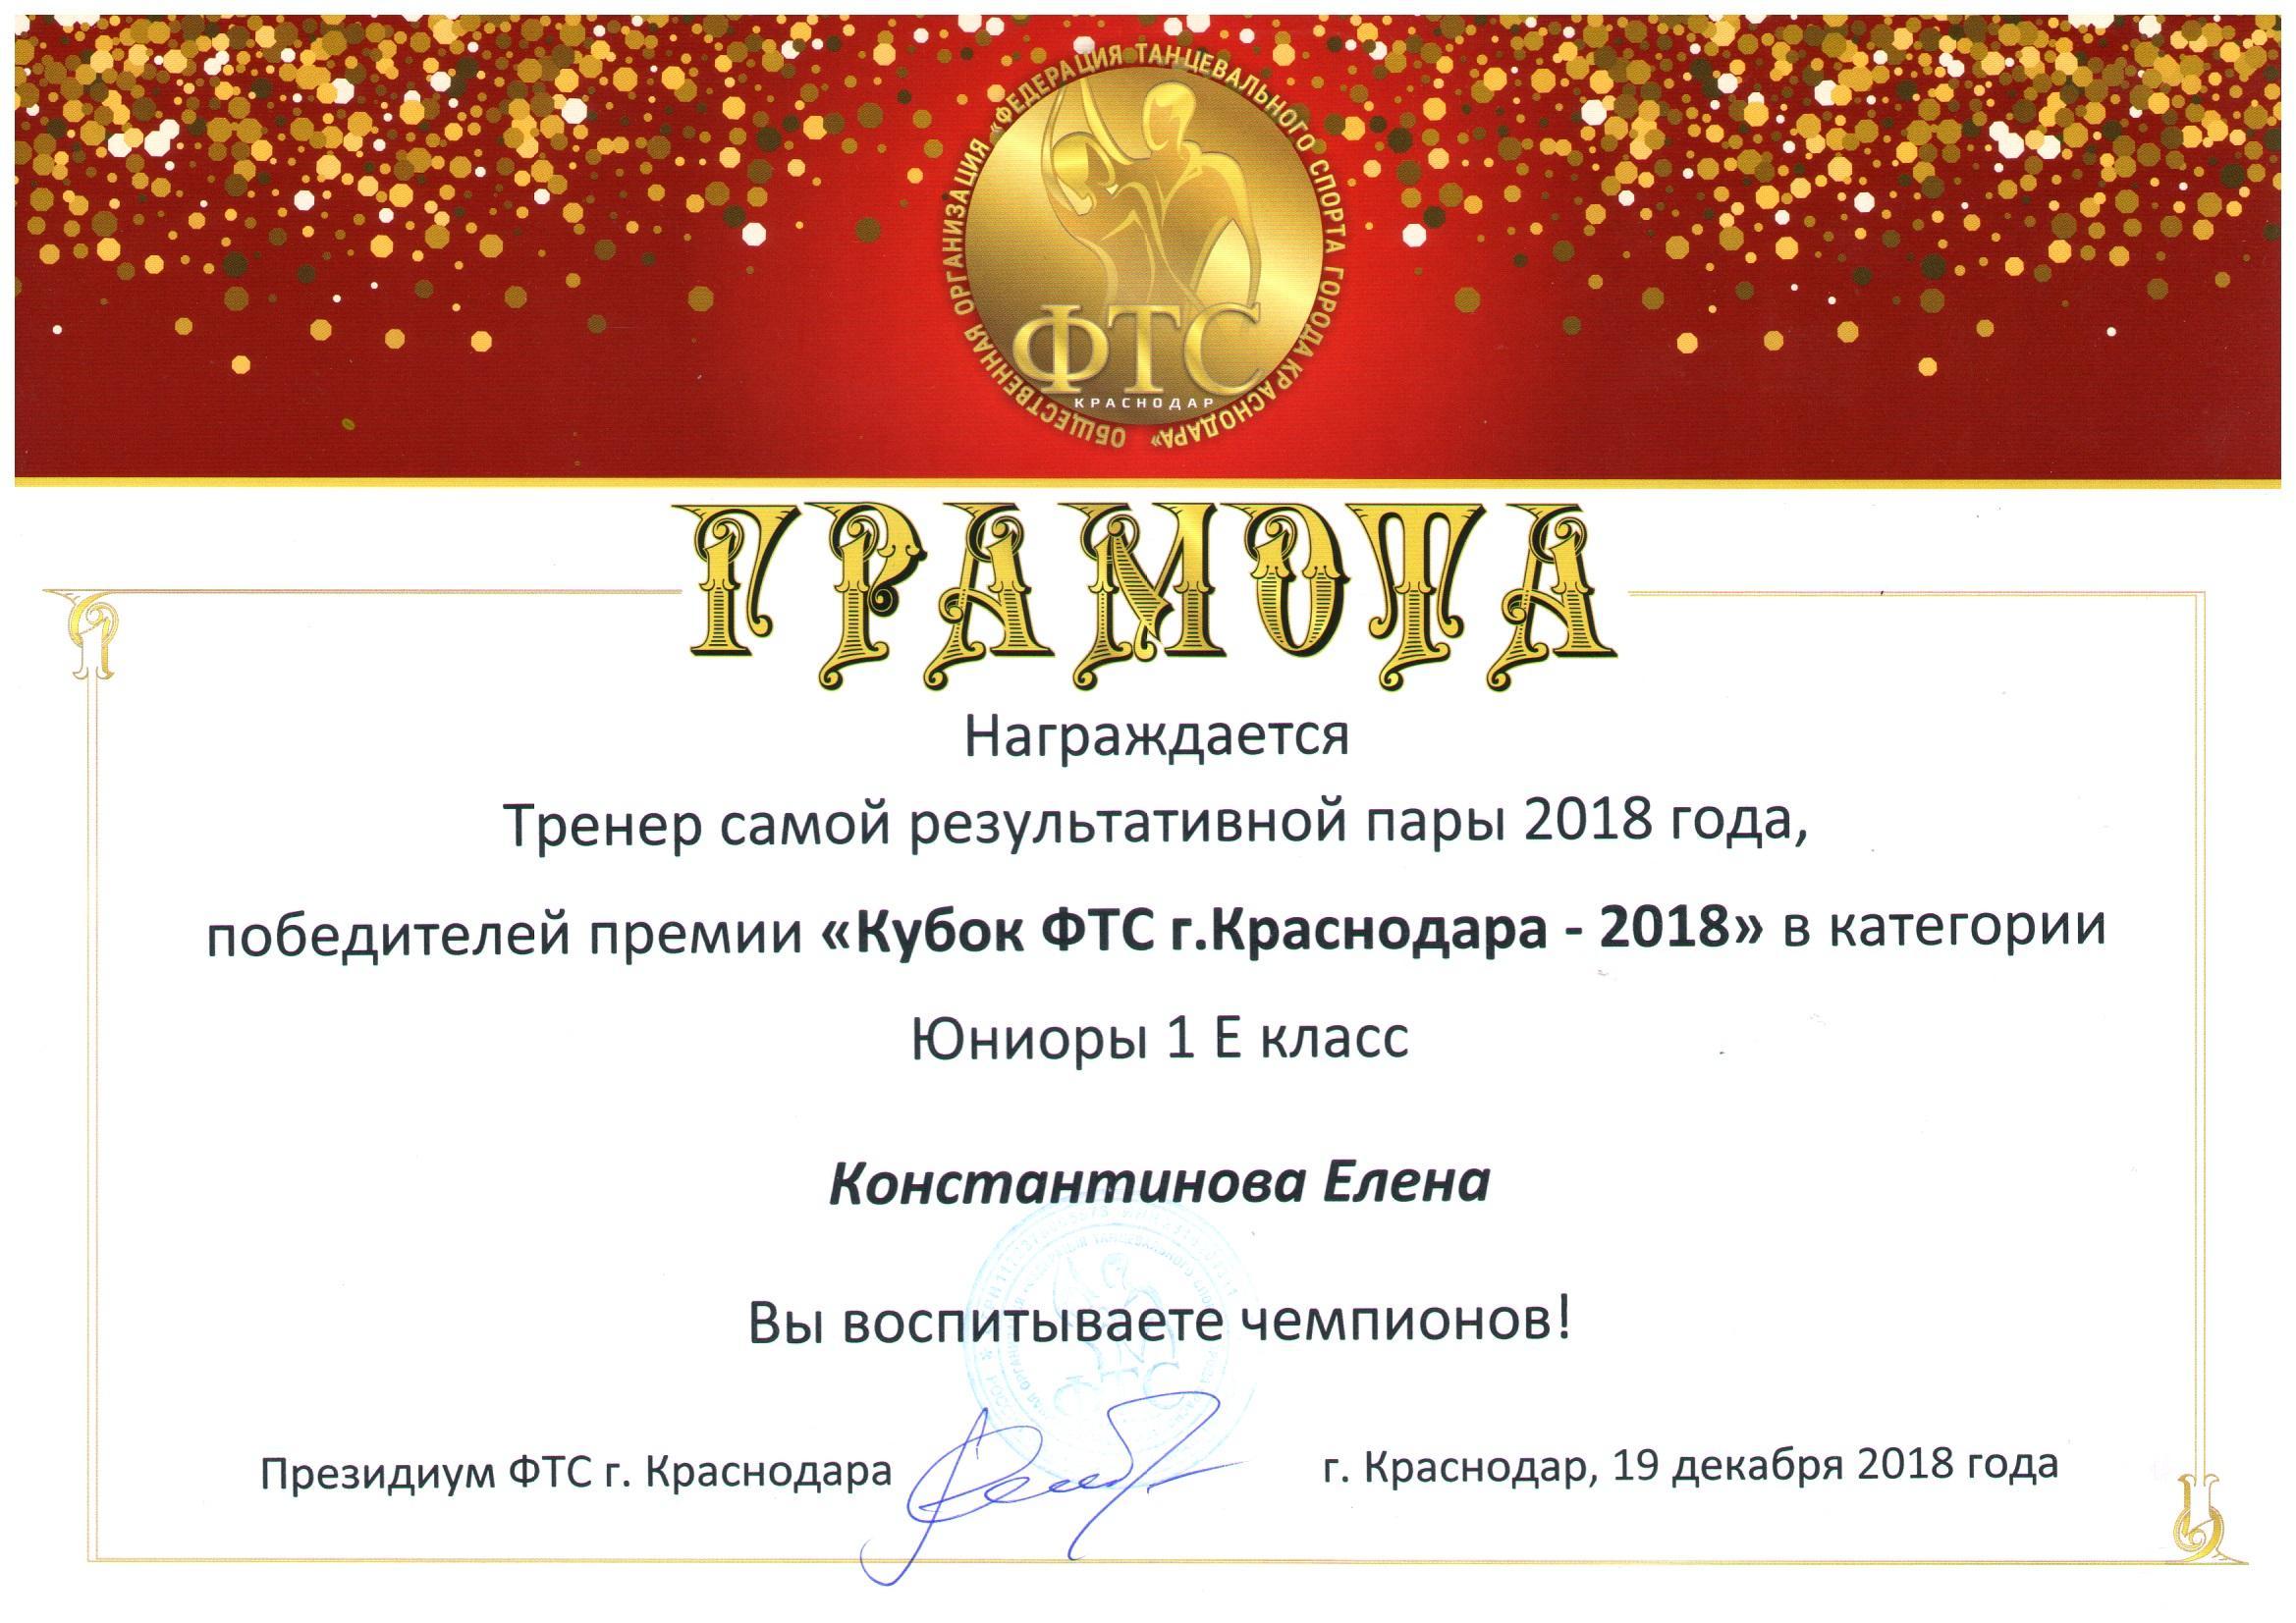 sertificate_10